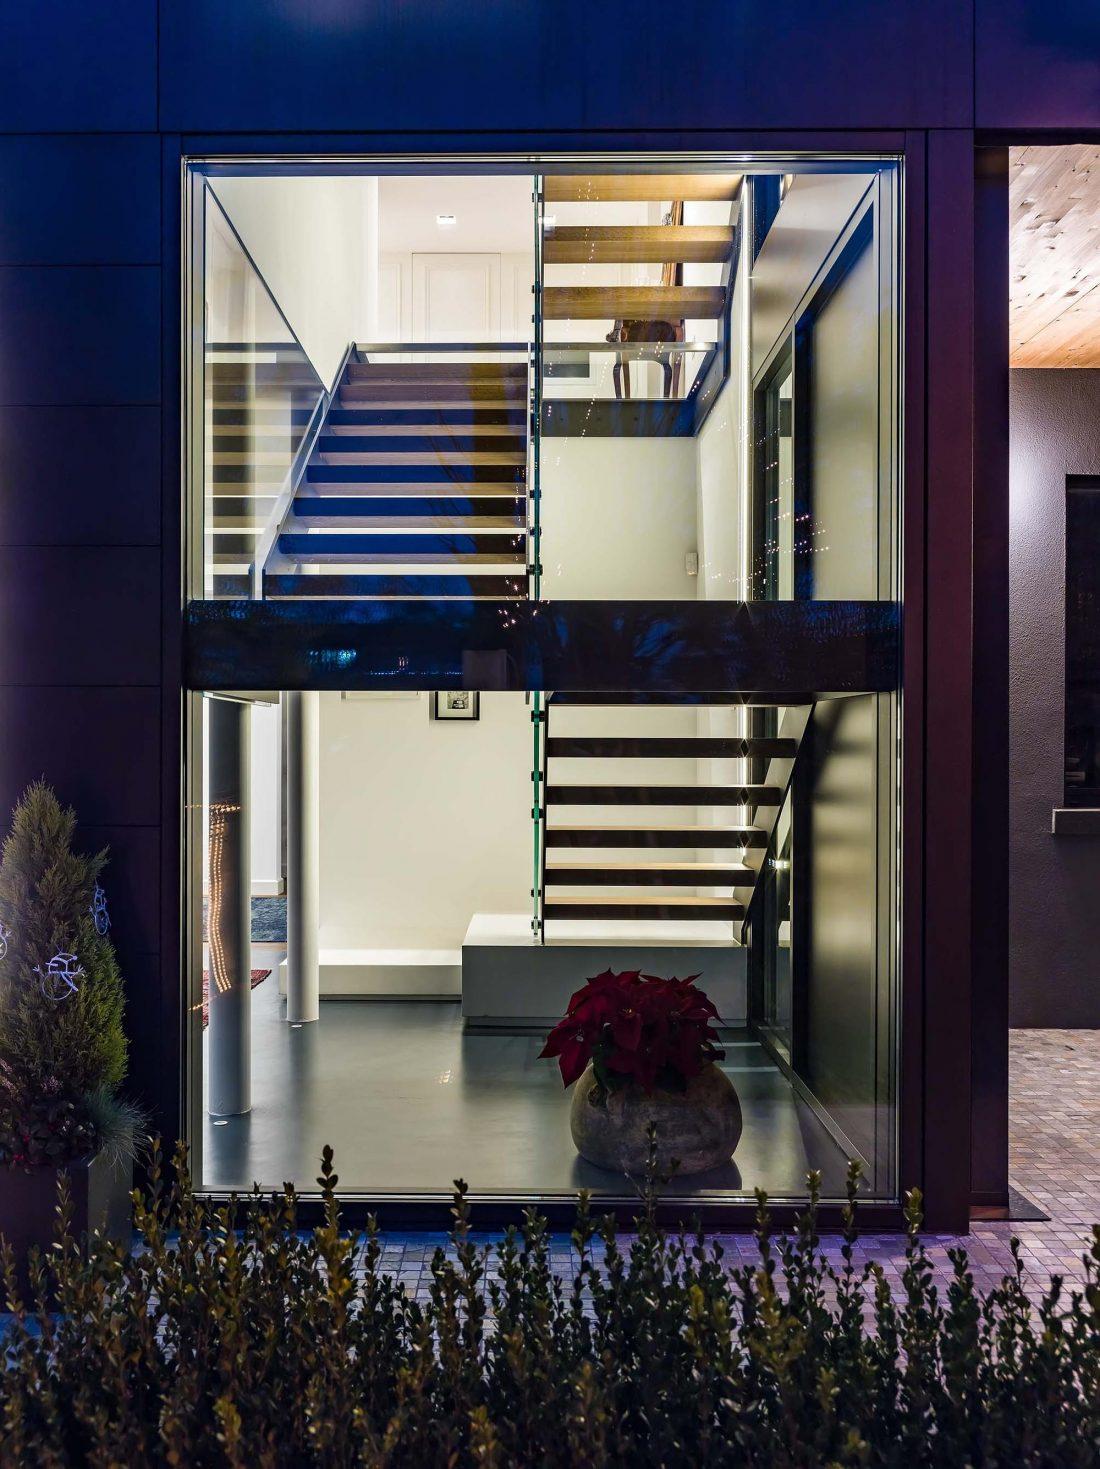 Дом в Порденоне, Италия, от студии Caprioglio Associati Architects 5